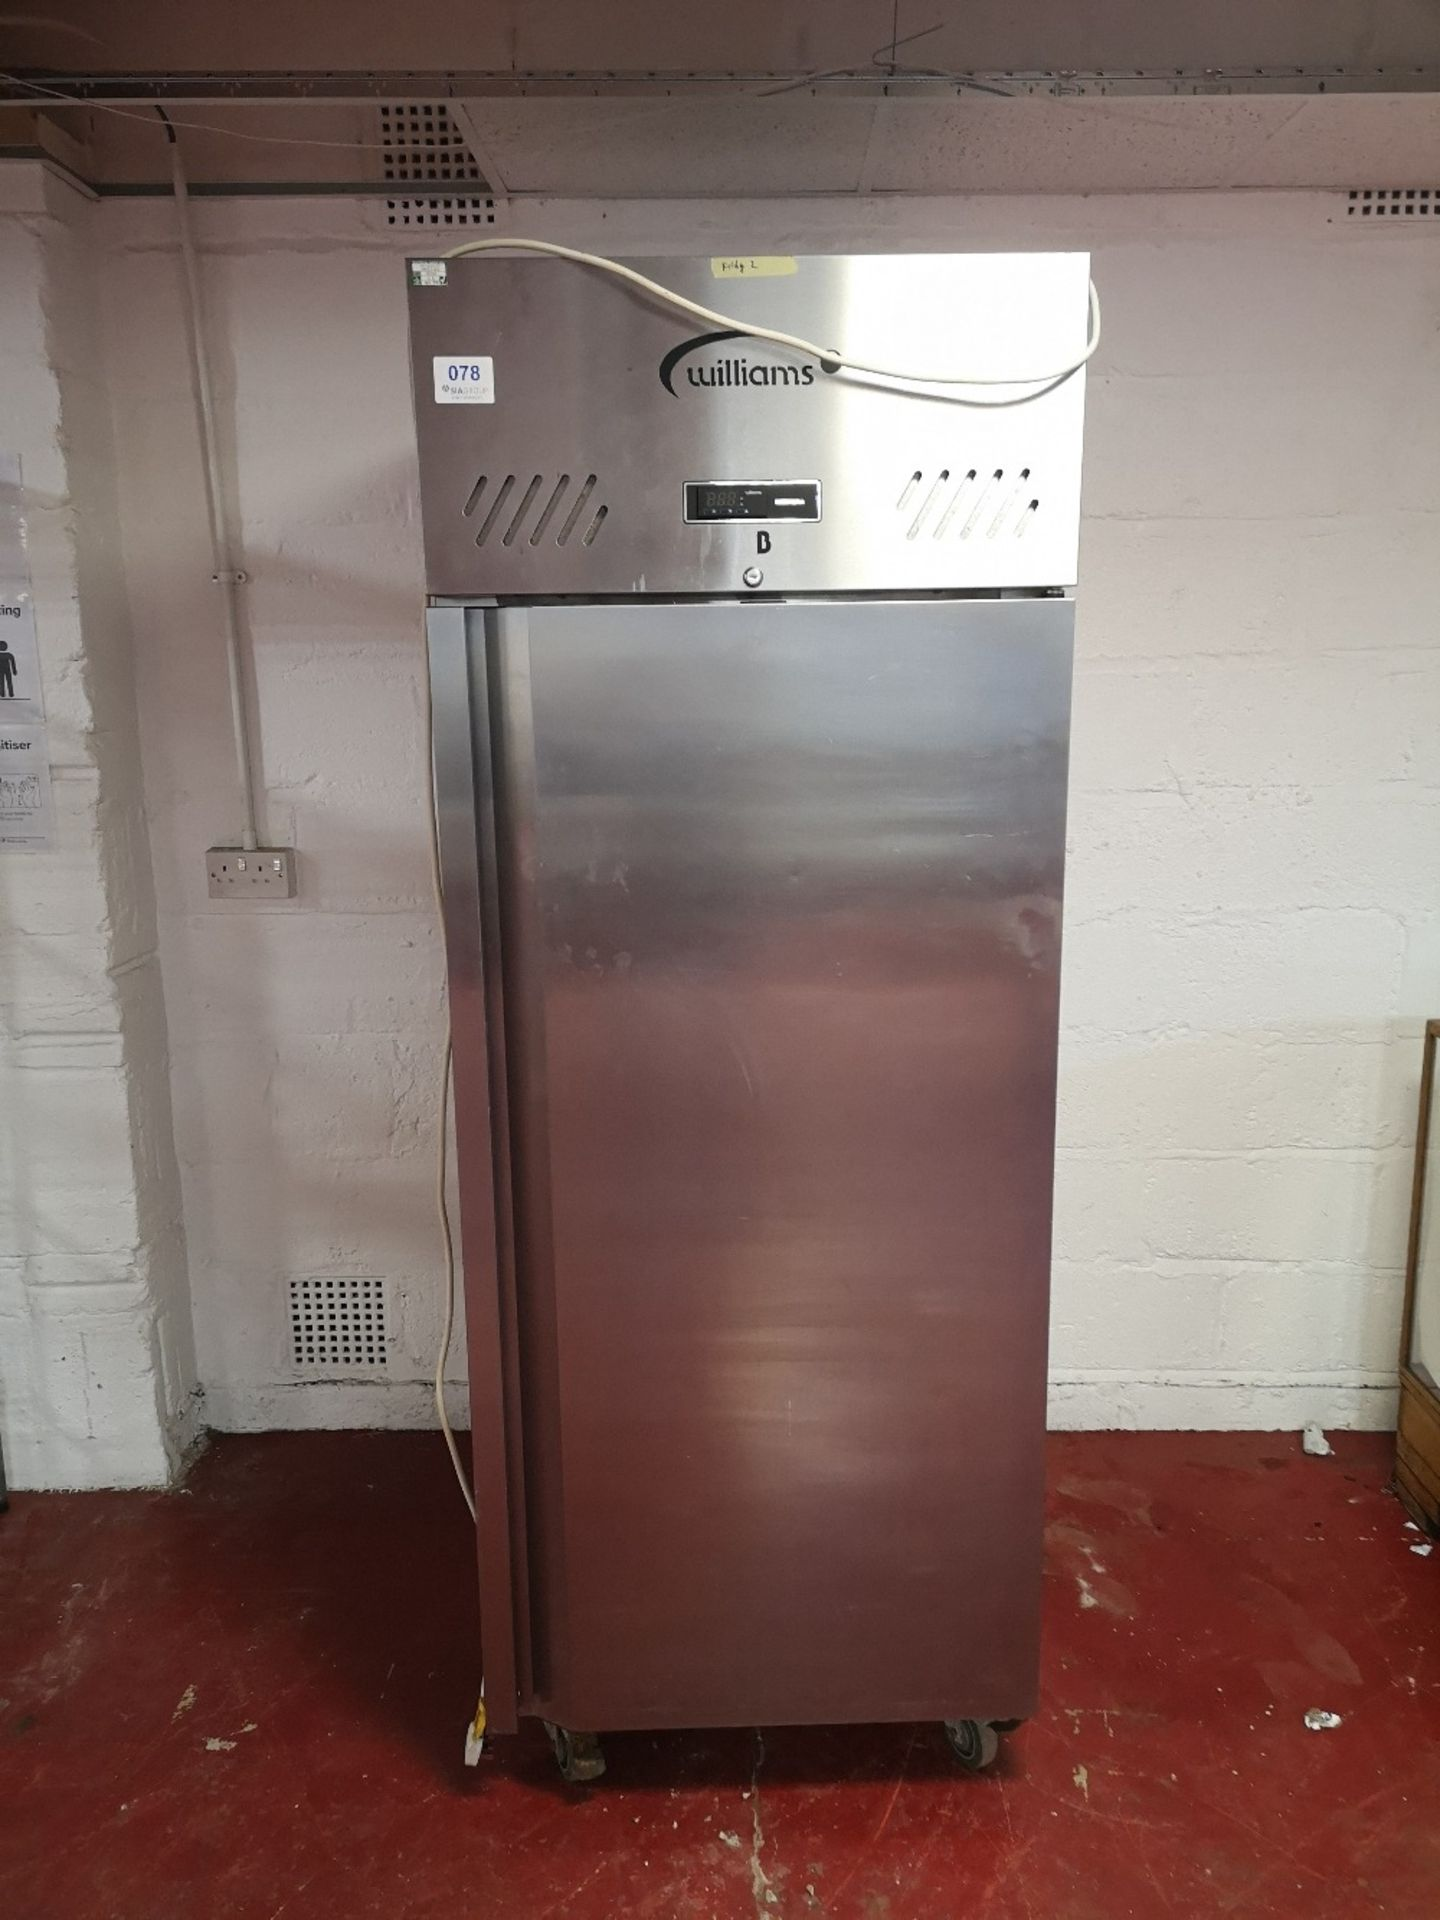 Williams Jade HJ1SA R1 620Ltr Single Door Upright Stainless Steel Fridge